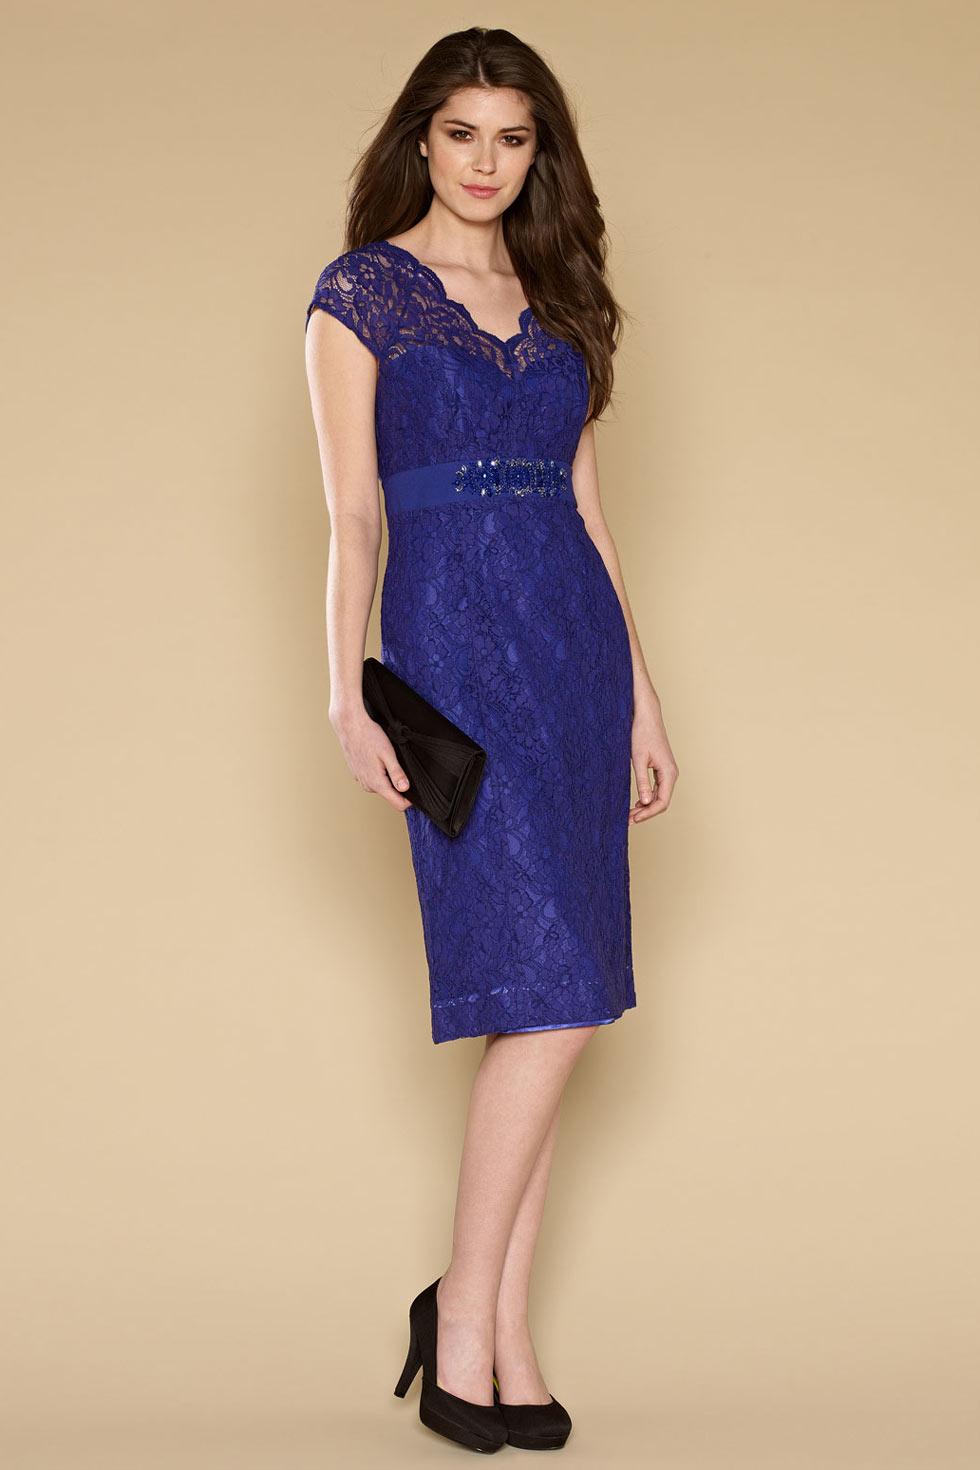 robe de soir e courte genoux en dentelle violette. Black Bedroom Furniture Sets. Home Design Ideas